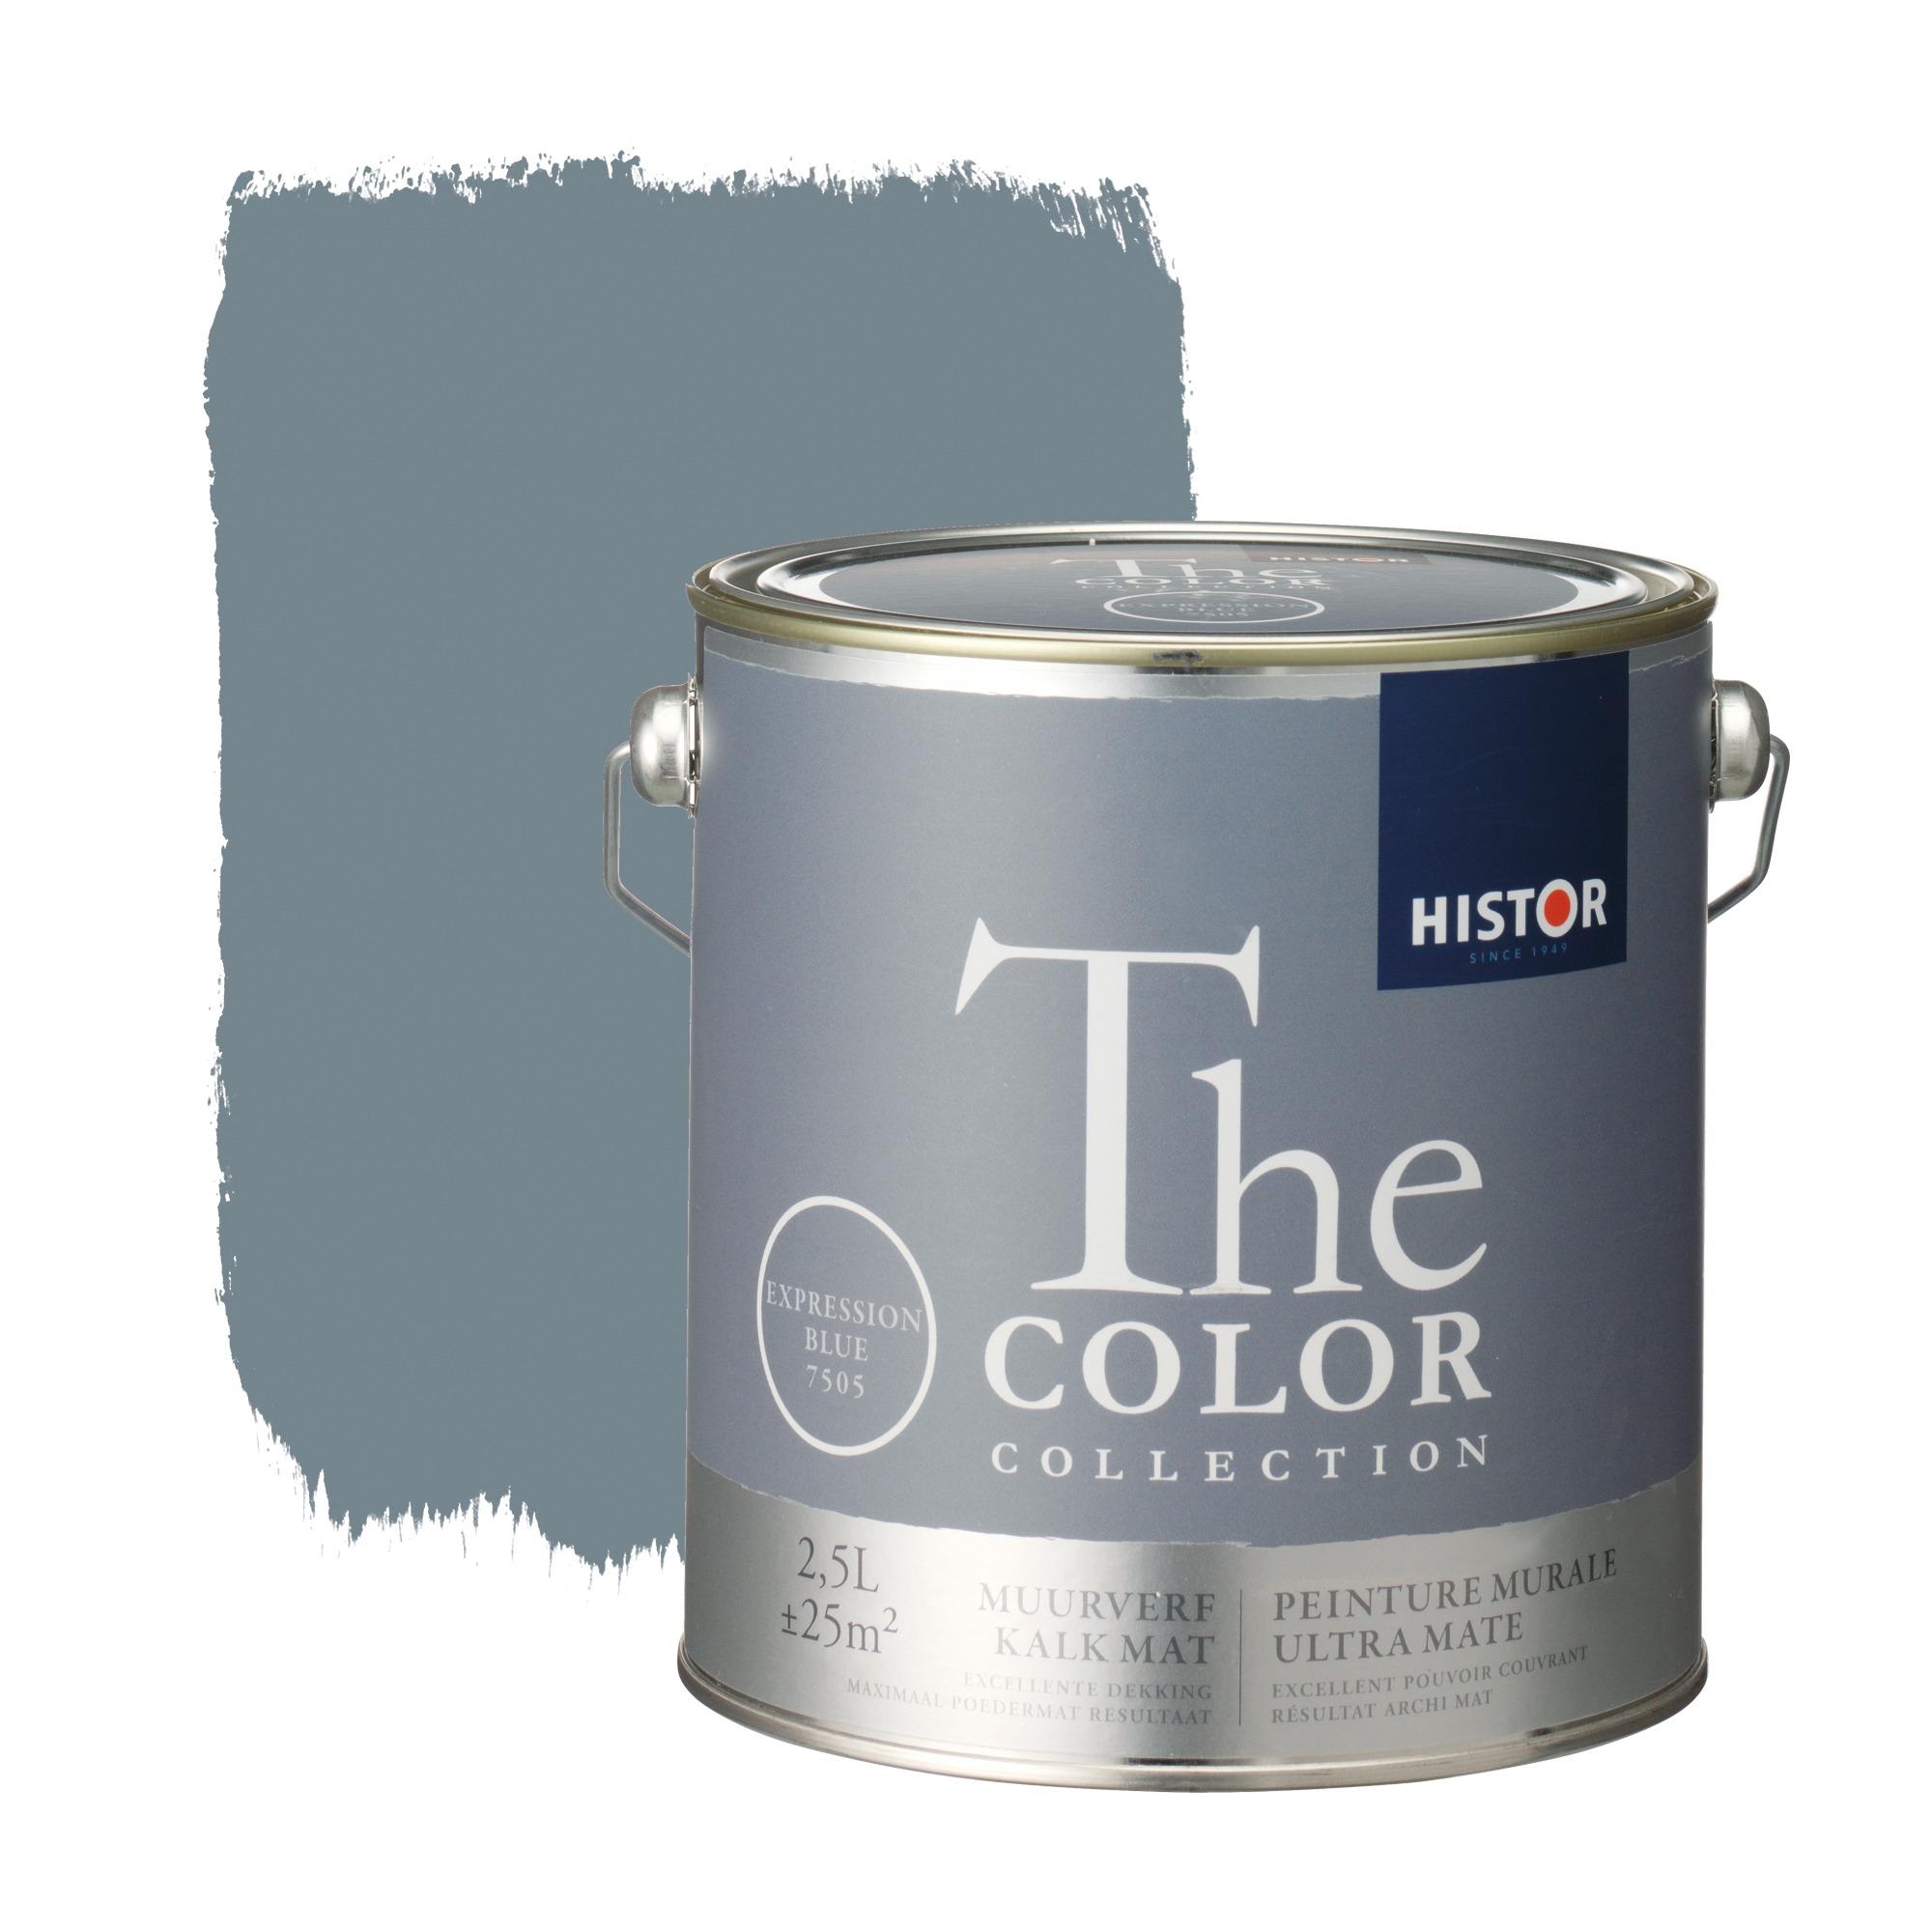 Histor the color collection muurverf kalkmat expression blue 7505 2,5 l